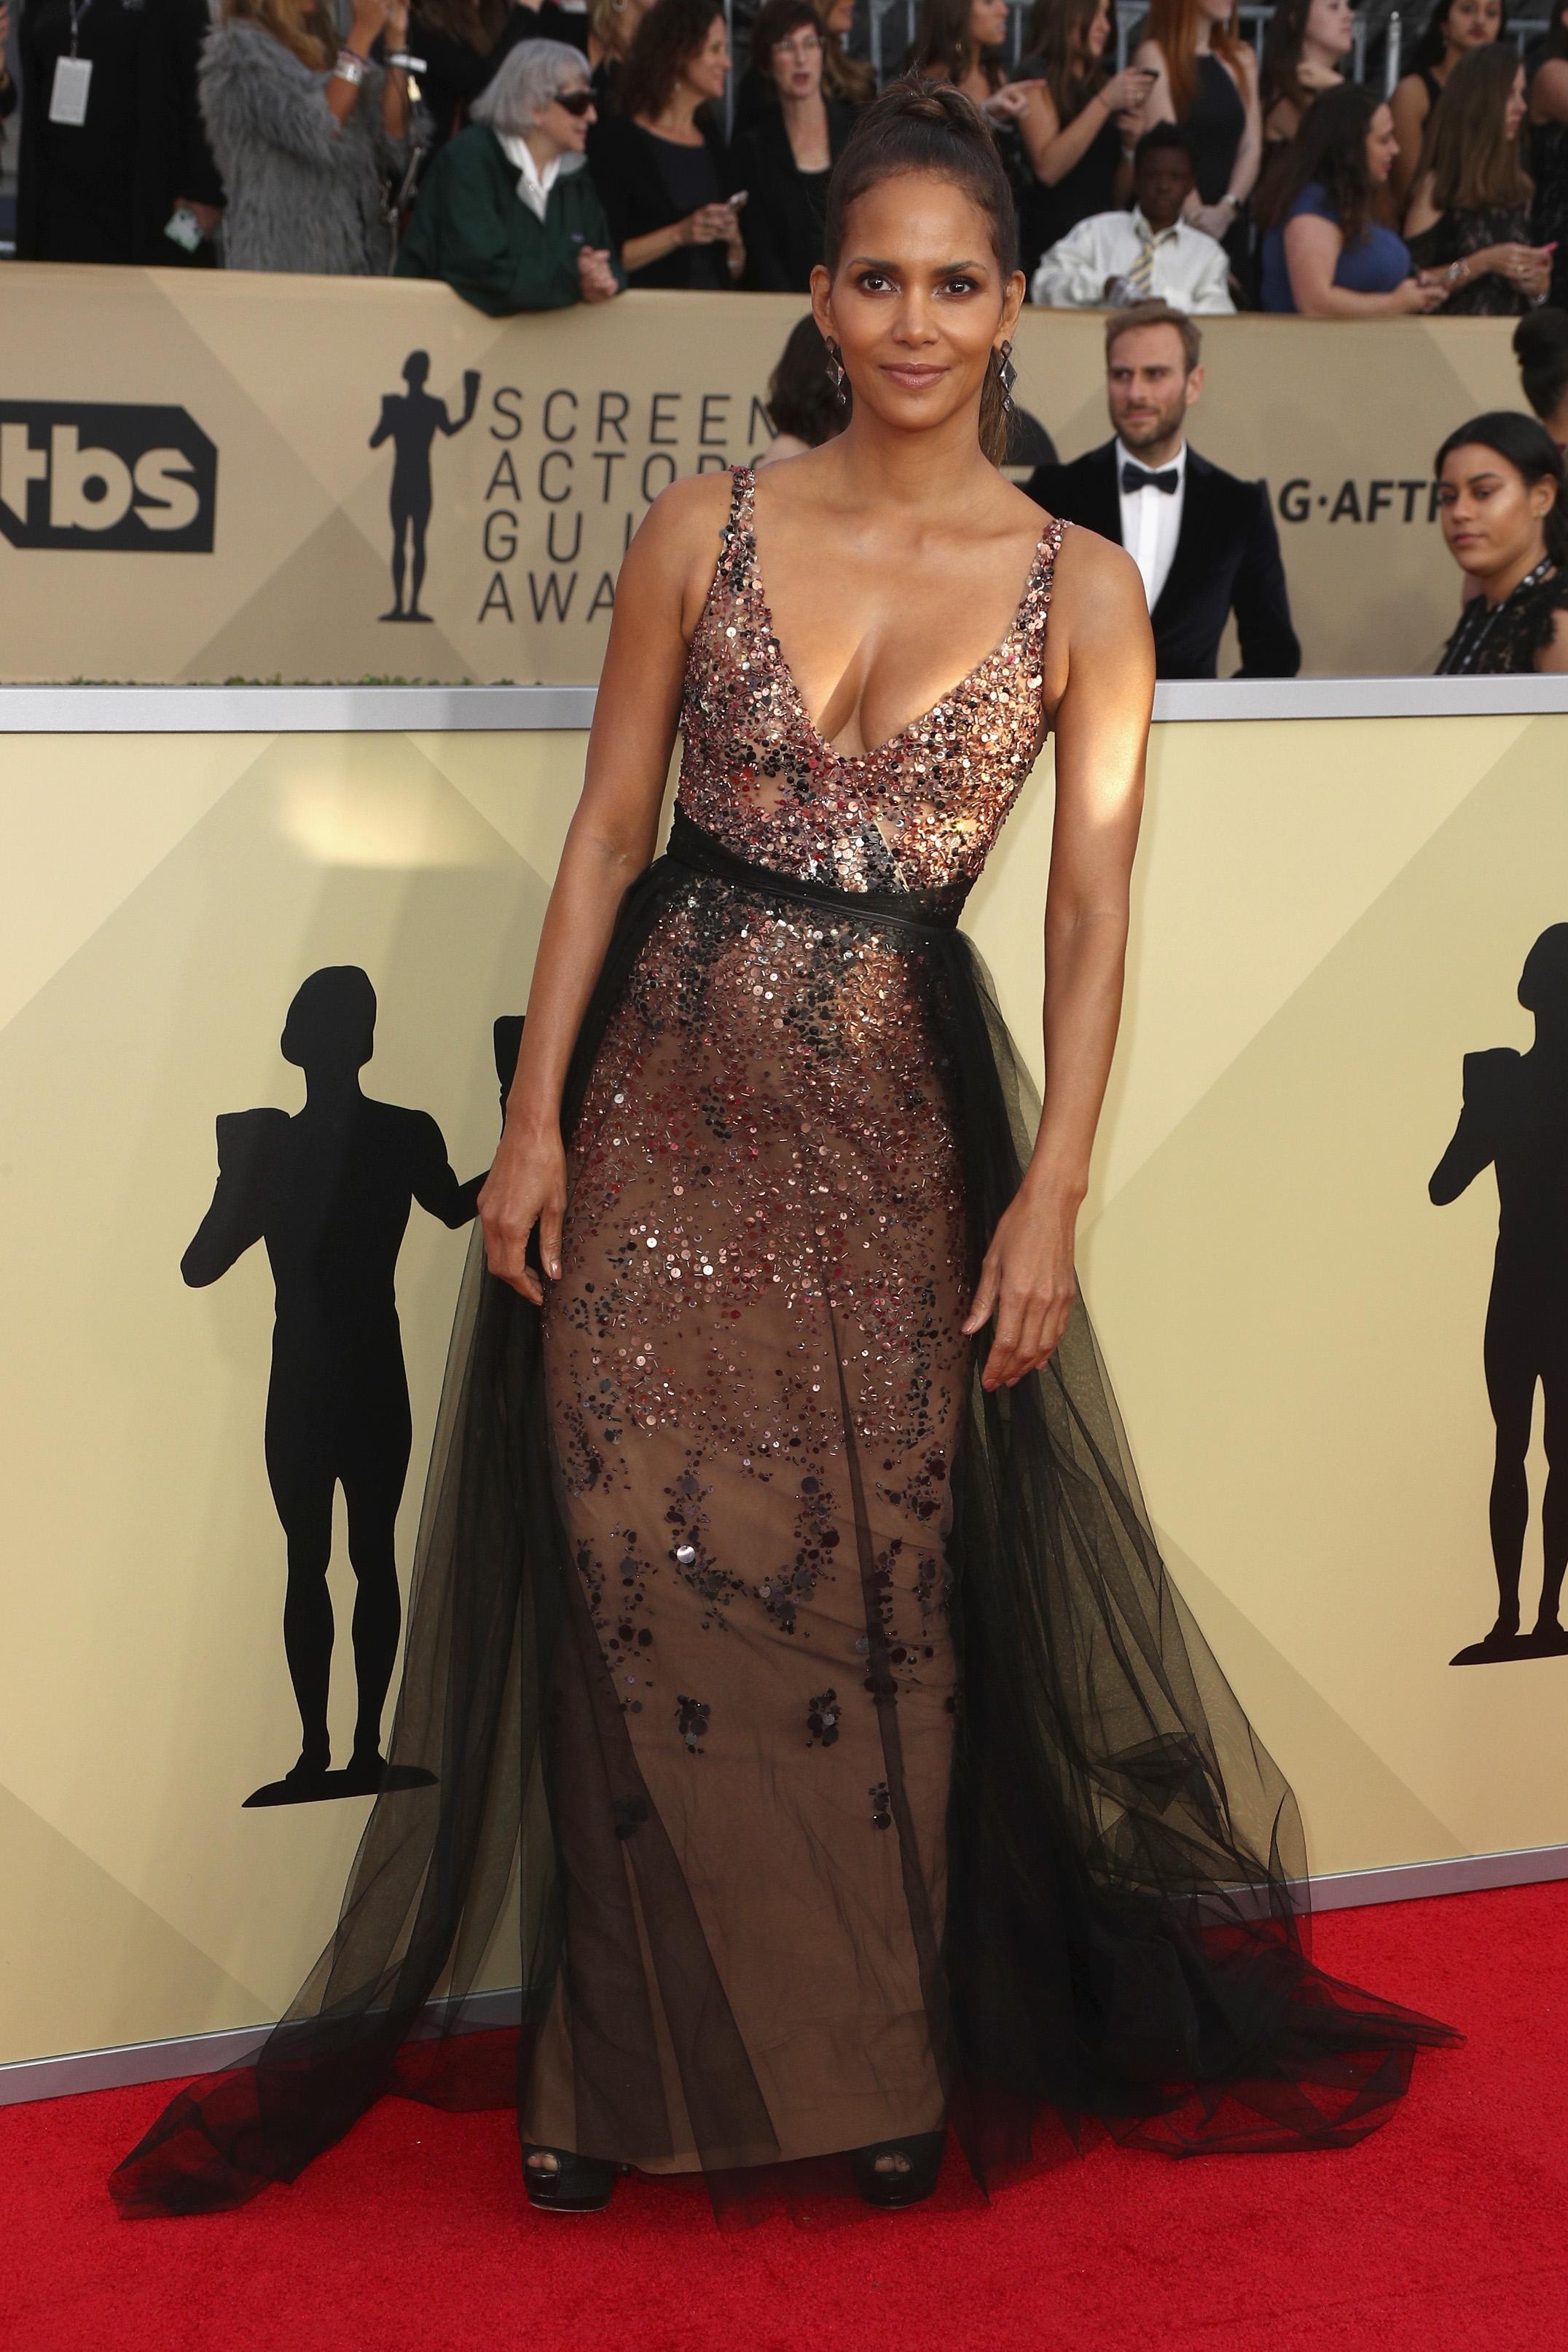 Halle Berry | Agence France-Presse